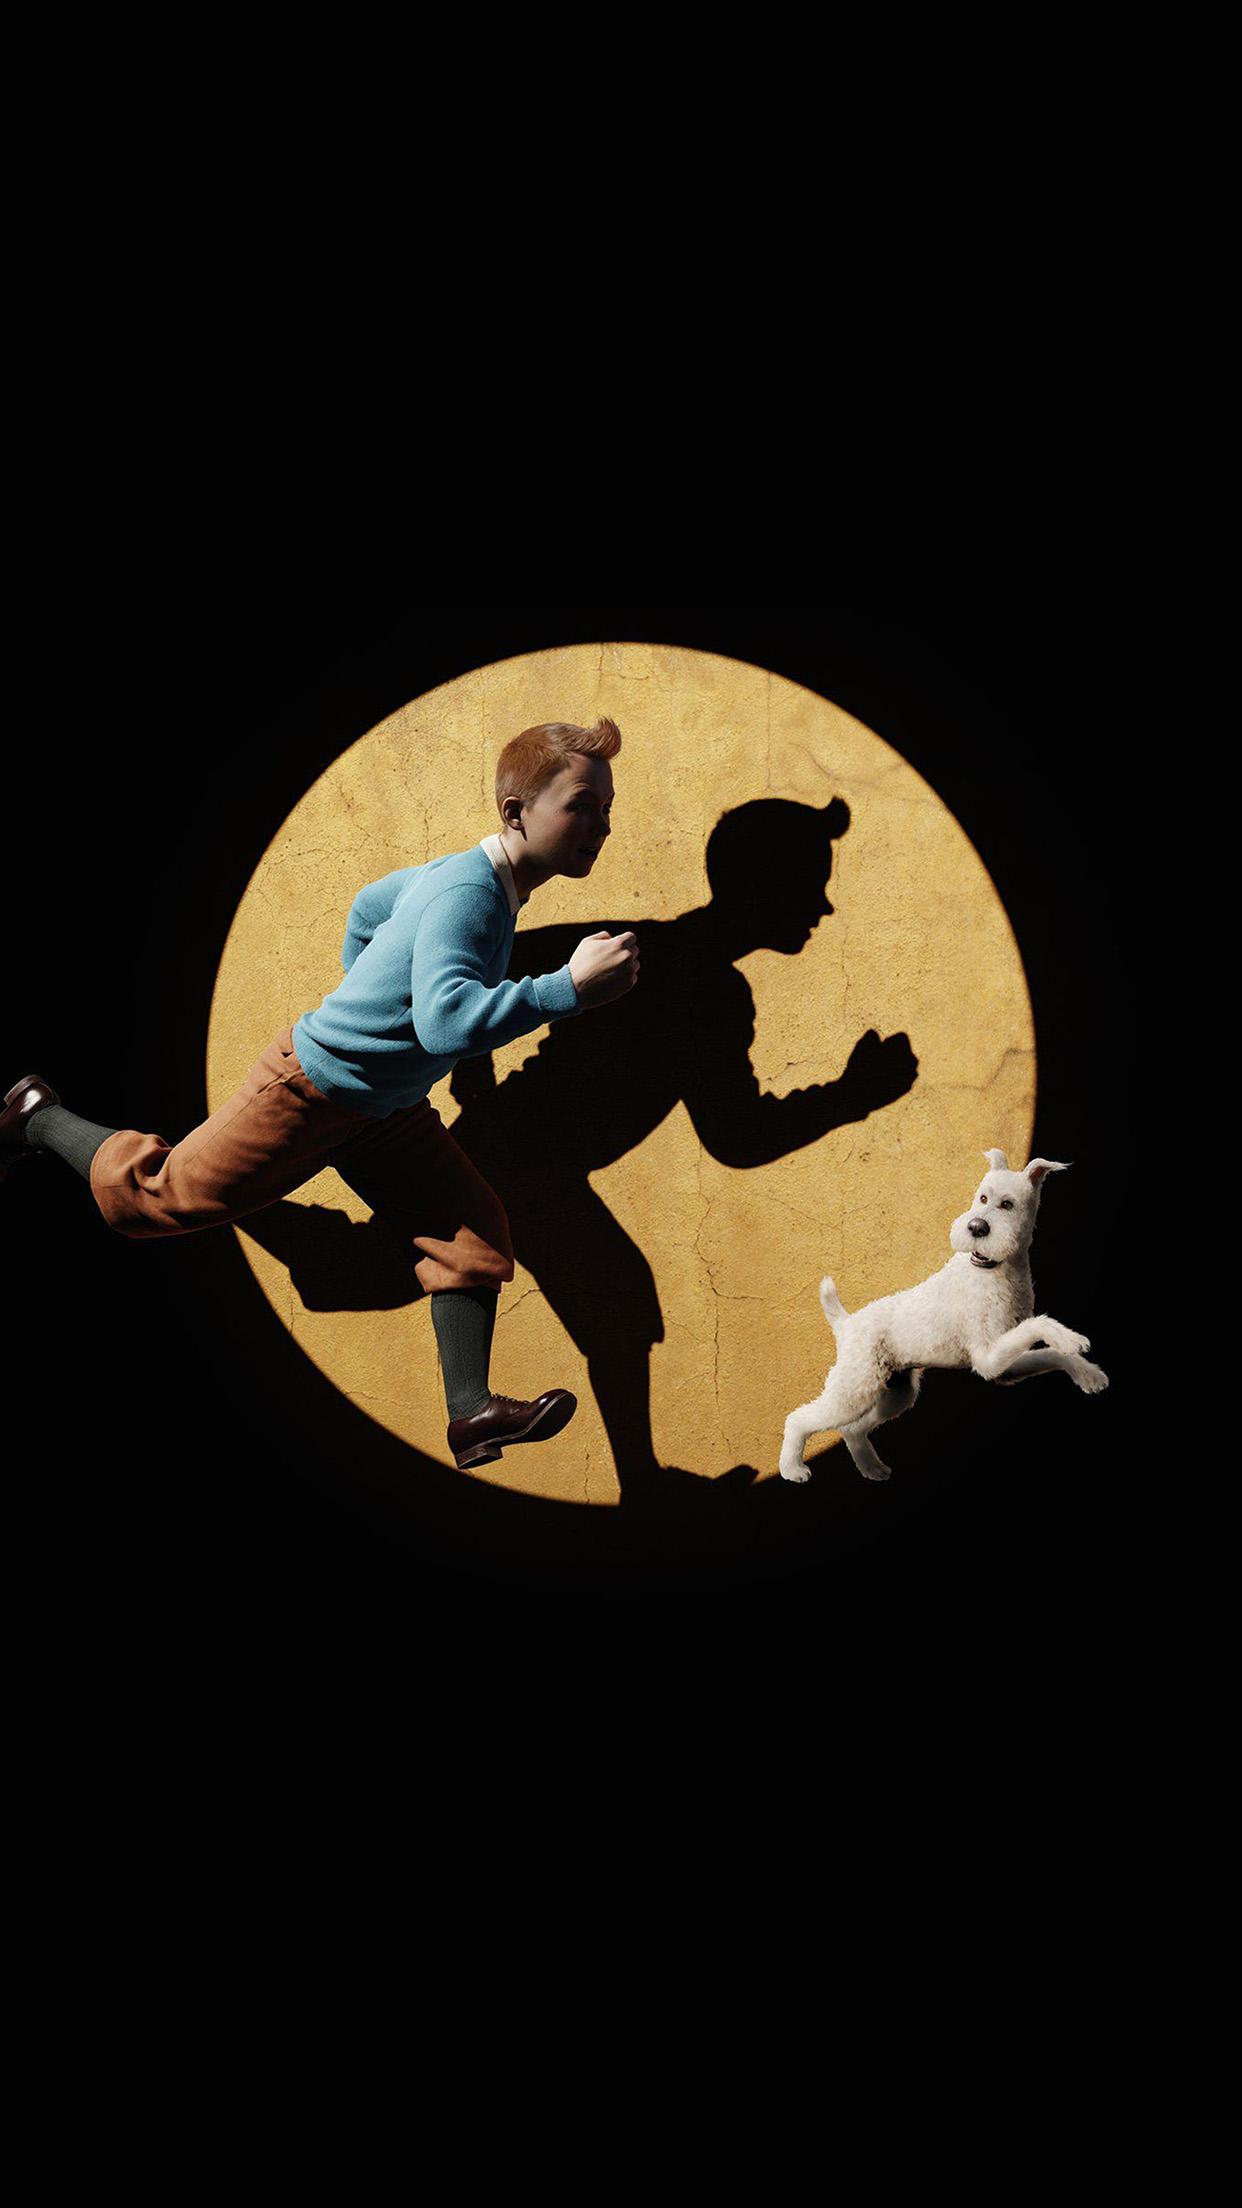 Tintin 3d Art Dark Illustration Android Wallpaper